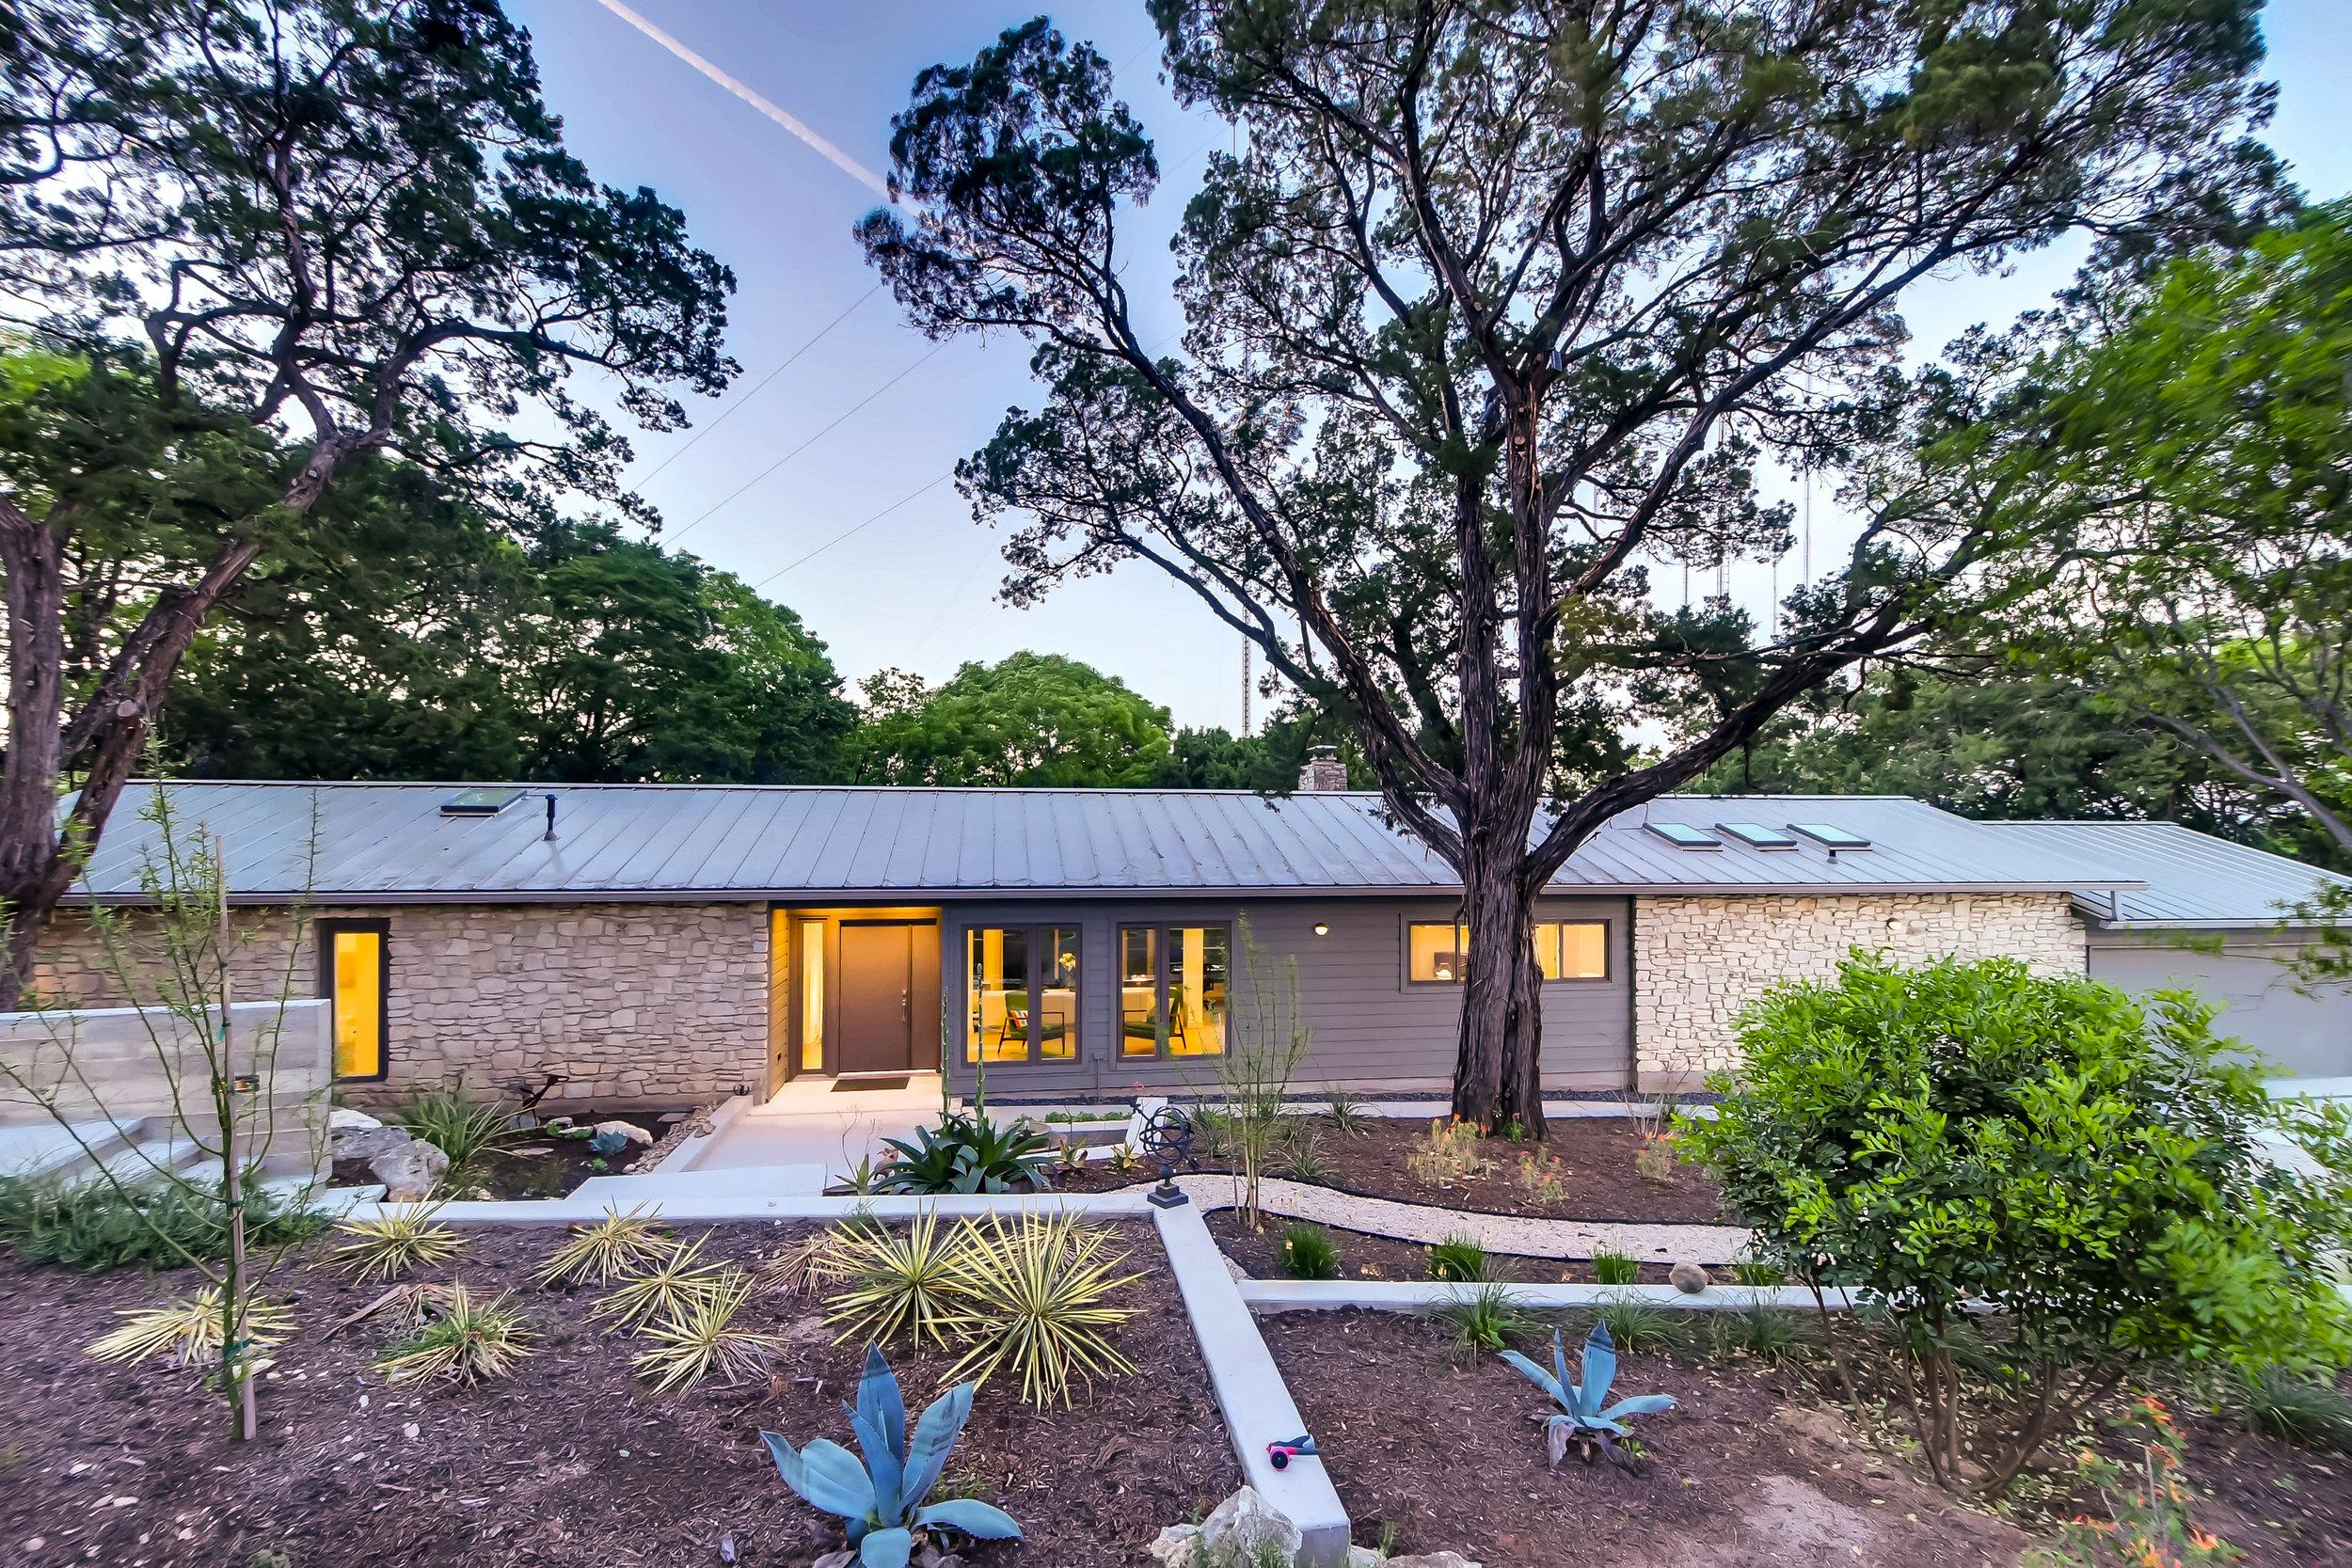 1502 Ridgecrest Drive | Sun 1-3 PM | $1,145,000 | Listed by Clayton Bullock